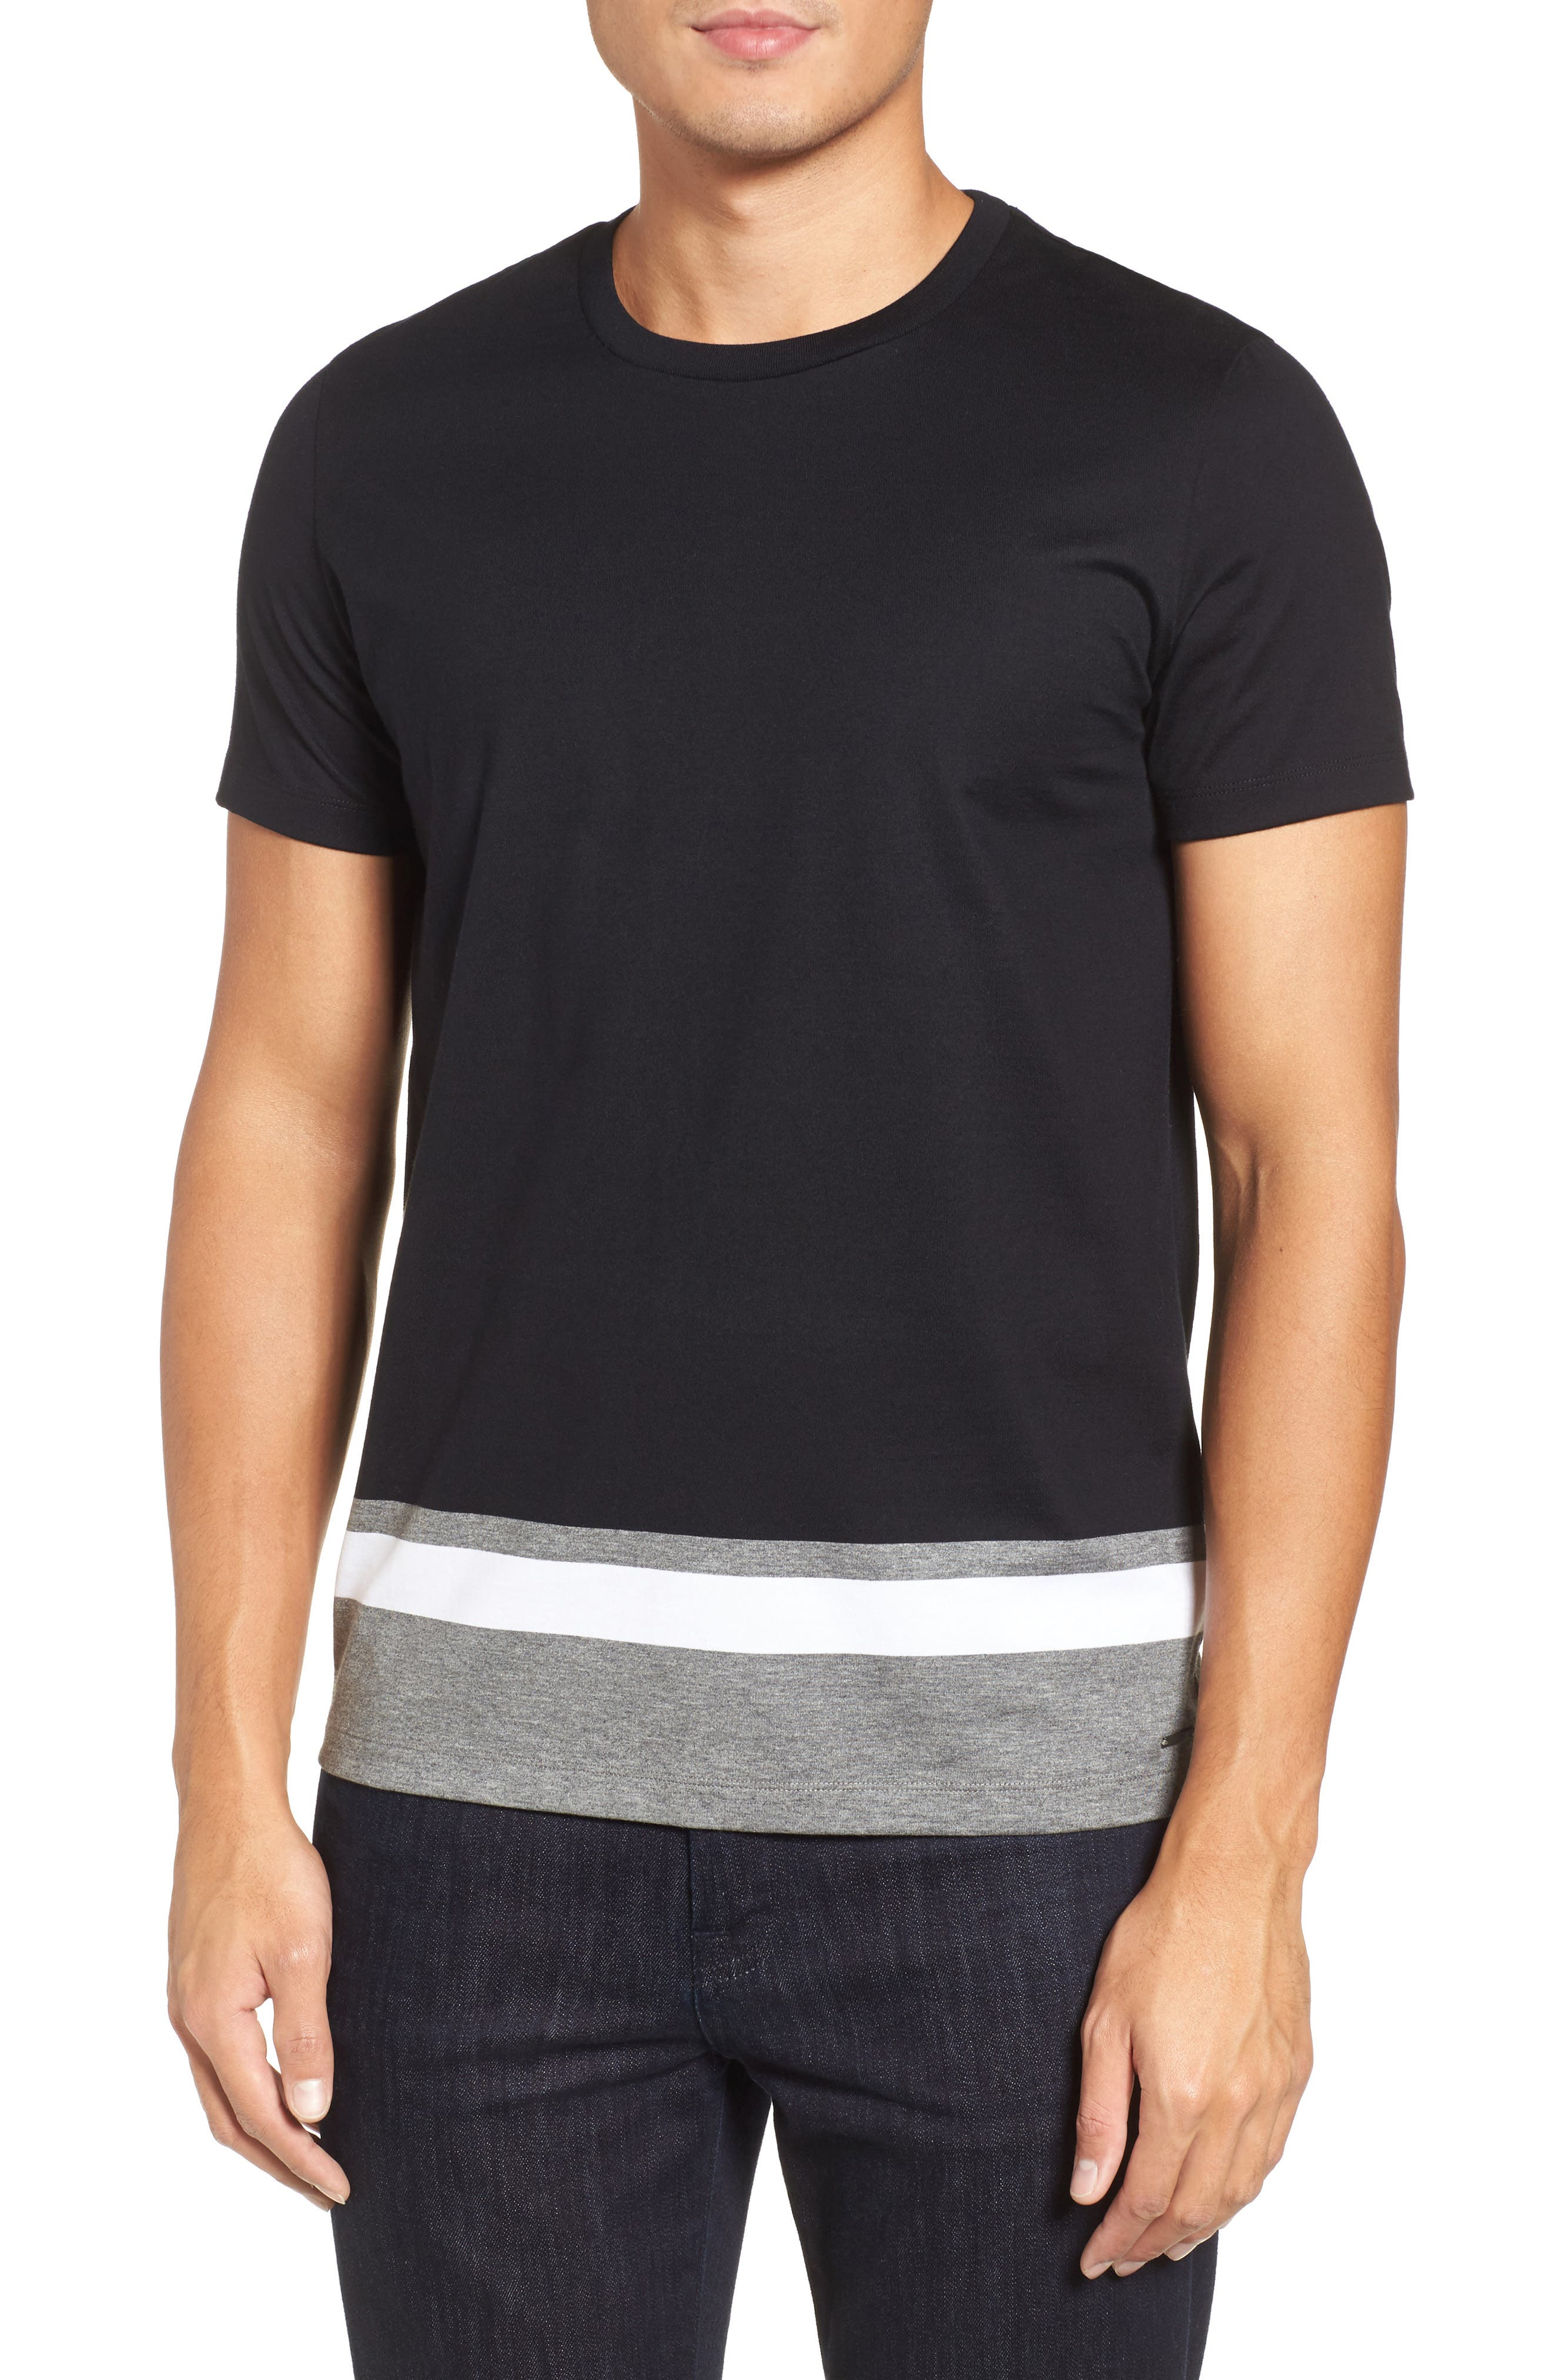 Tiburt Colorblock T-Shirt,                             Main thumbnail 1, color,                             Black